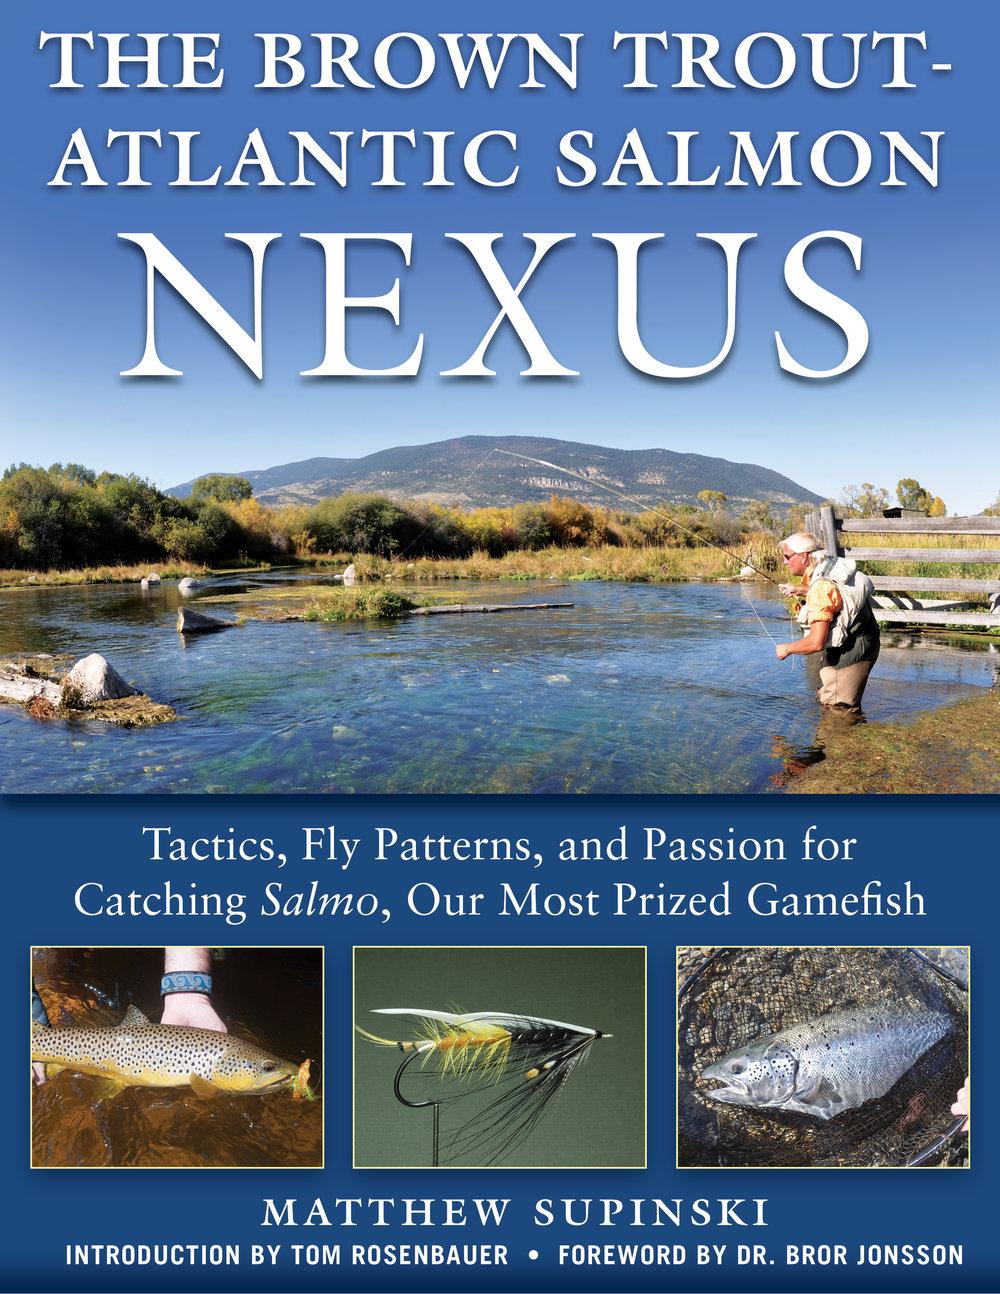 NEW COVER NEXUS 1Brown  Trout-Atlantic Salmon Nexus (1).jpg